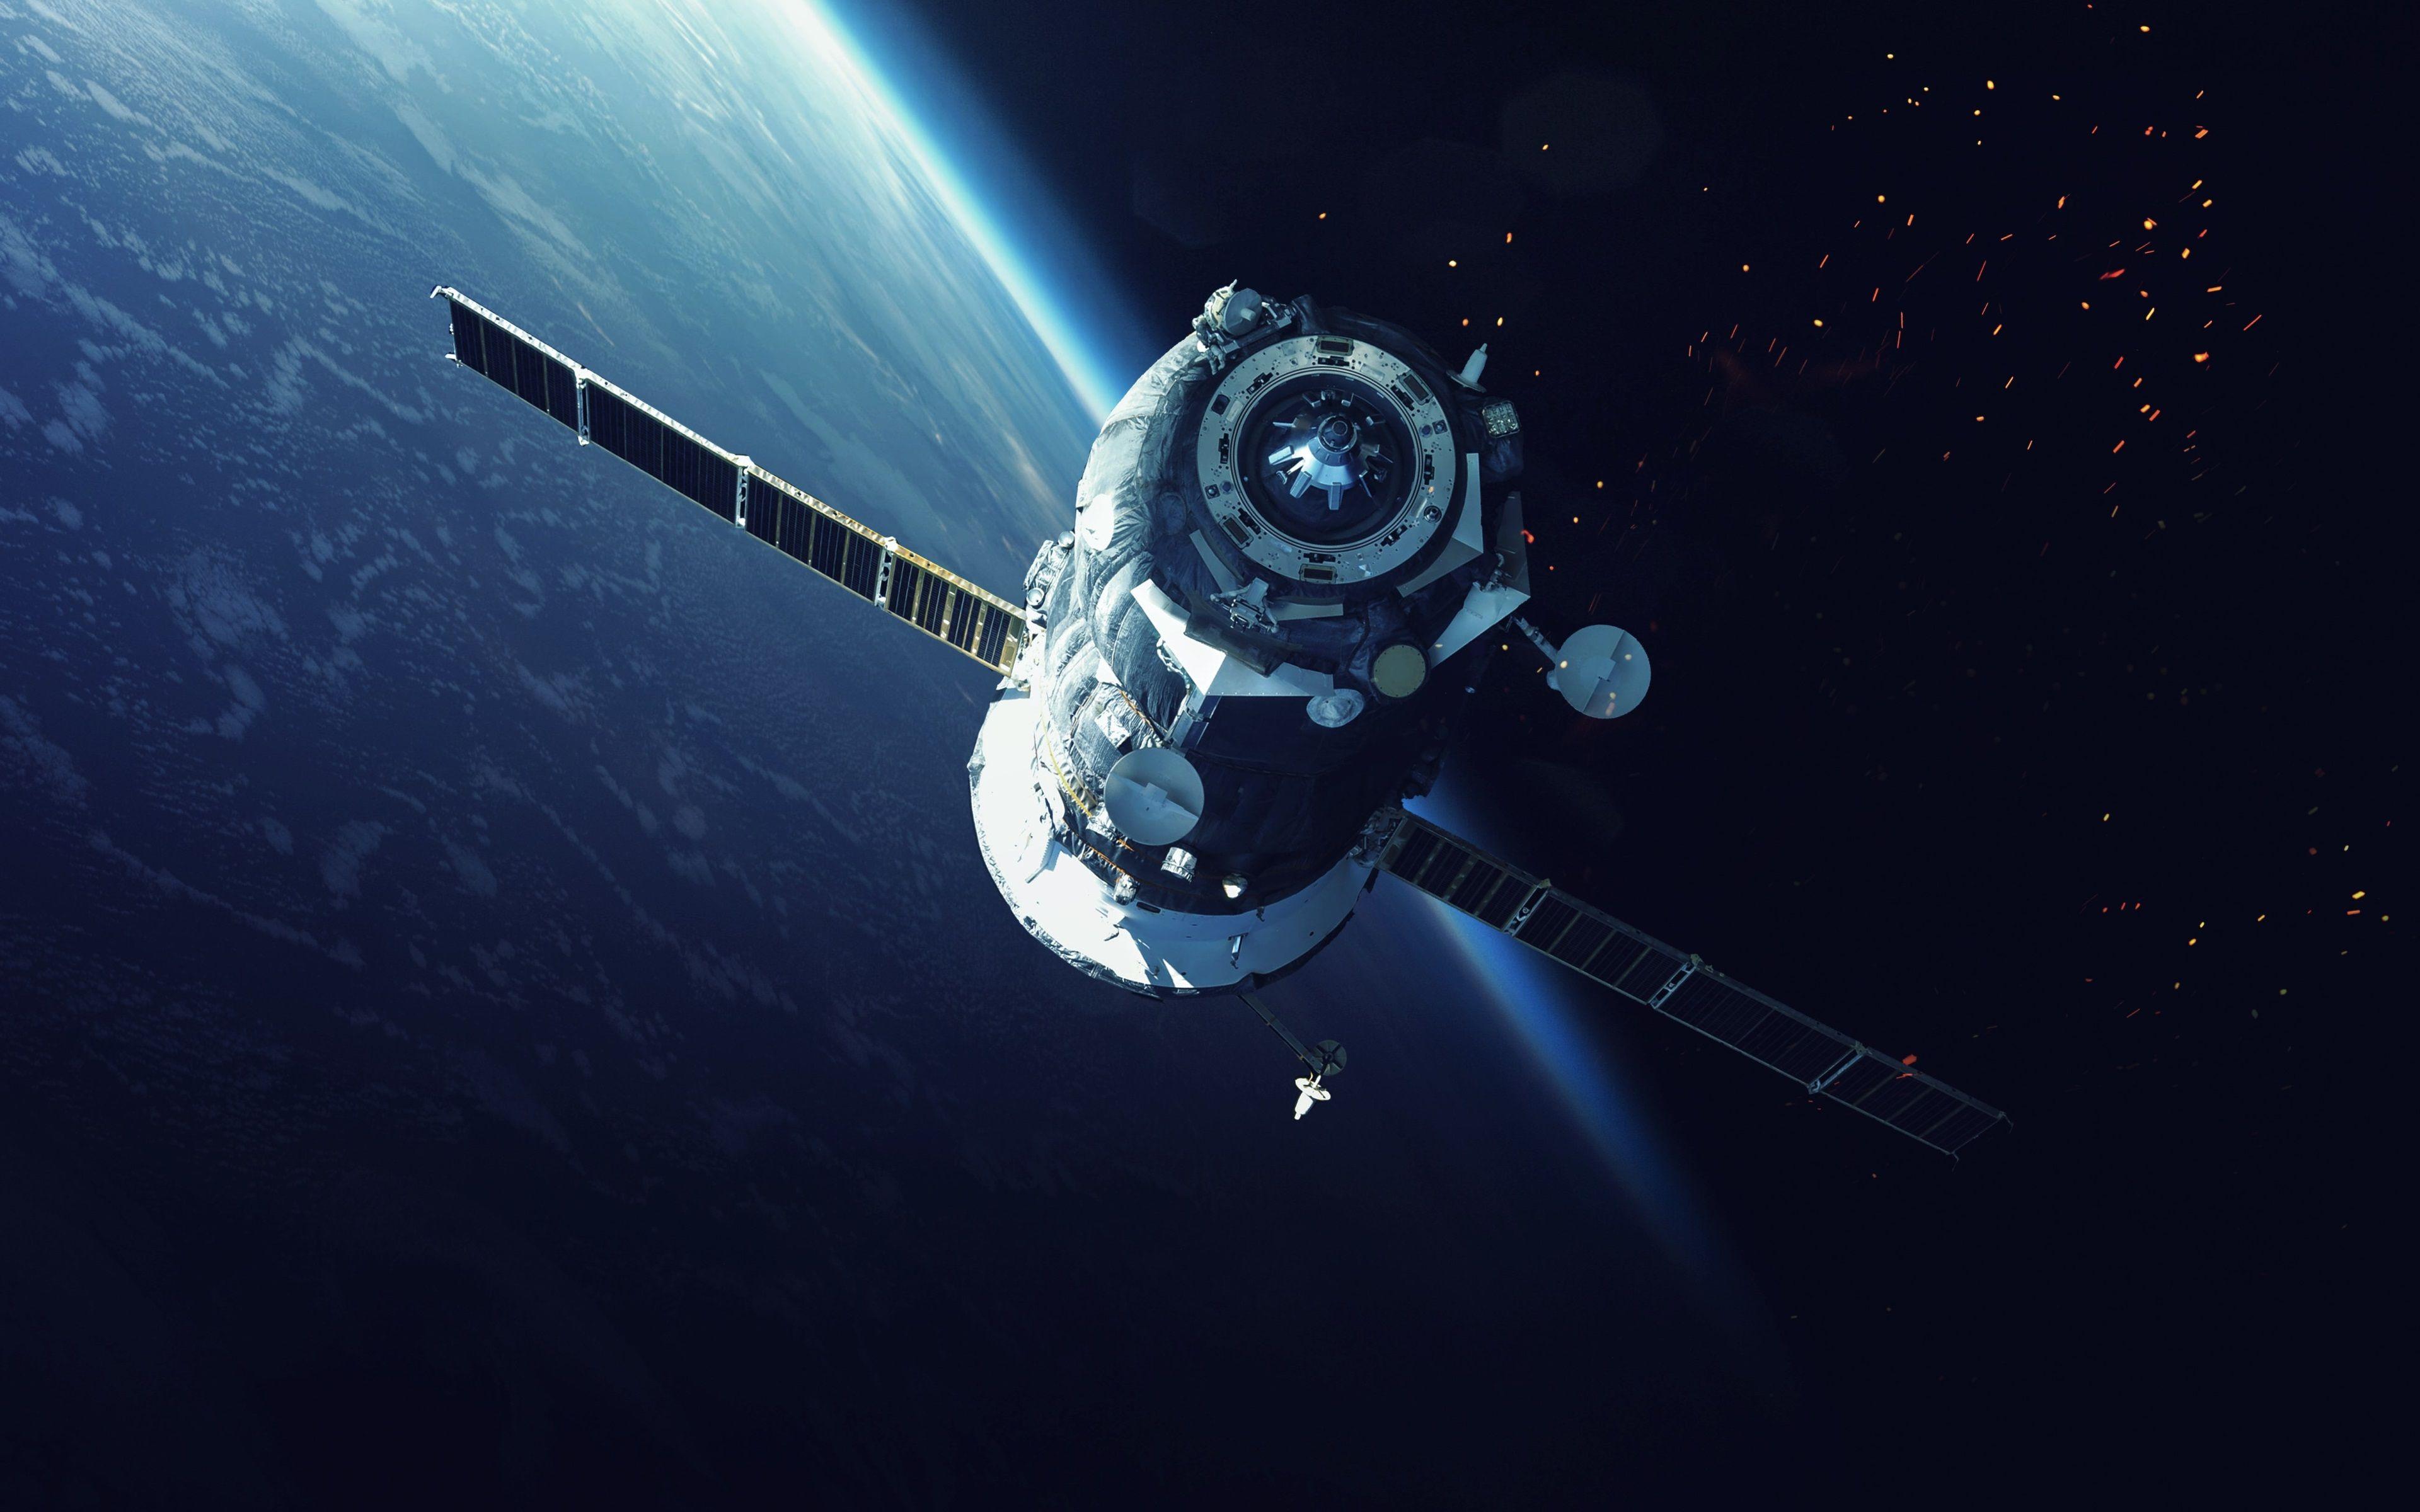 3840x2400 space satellite 4k high definition wallpaper